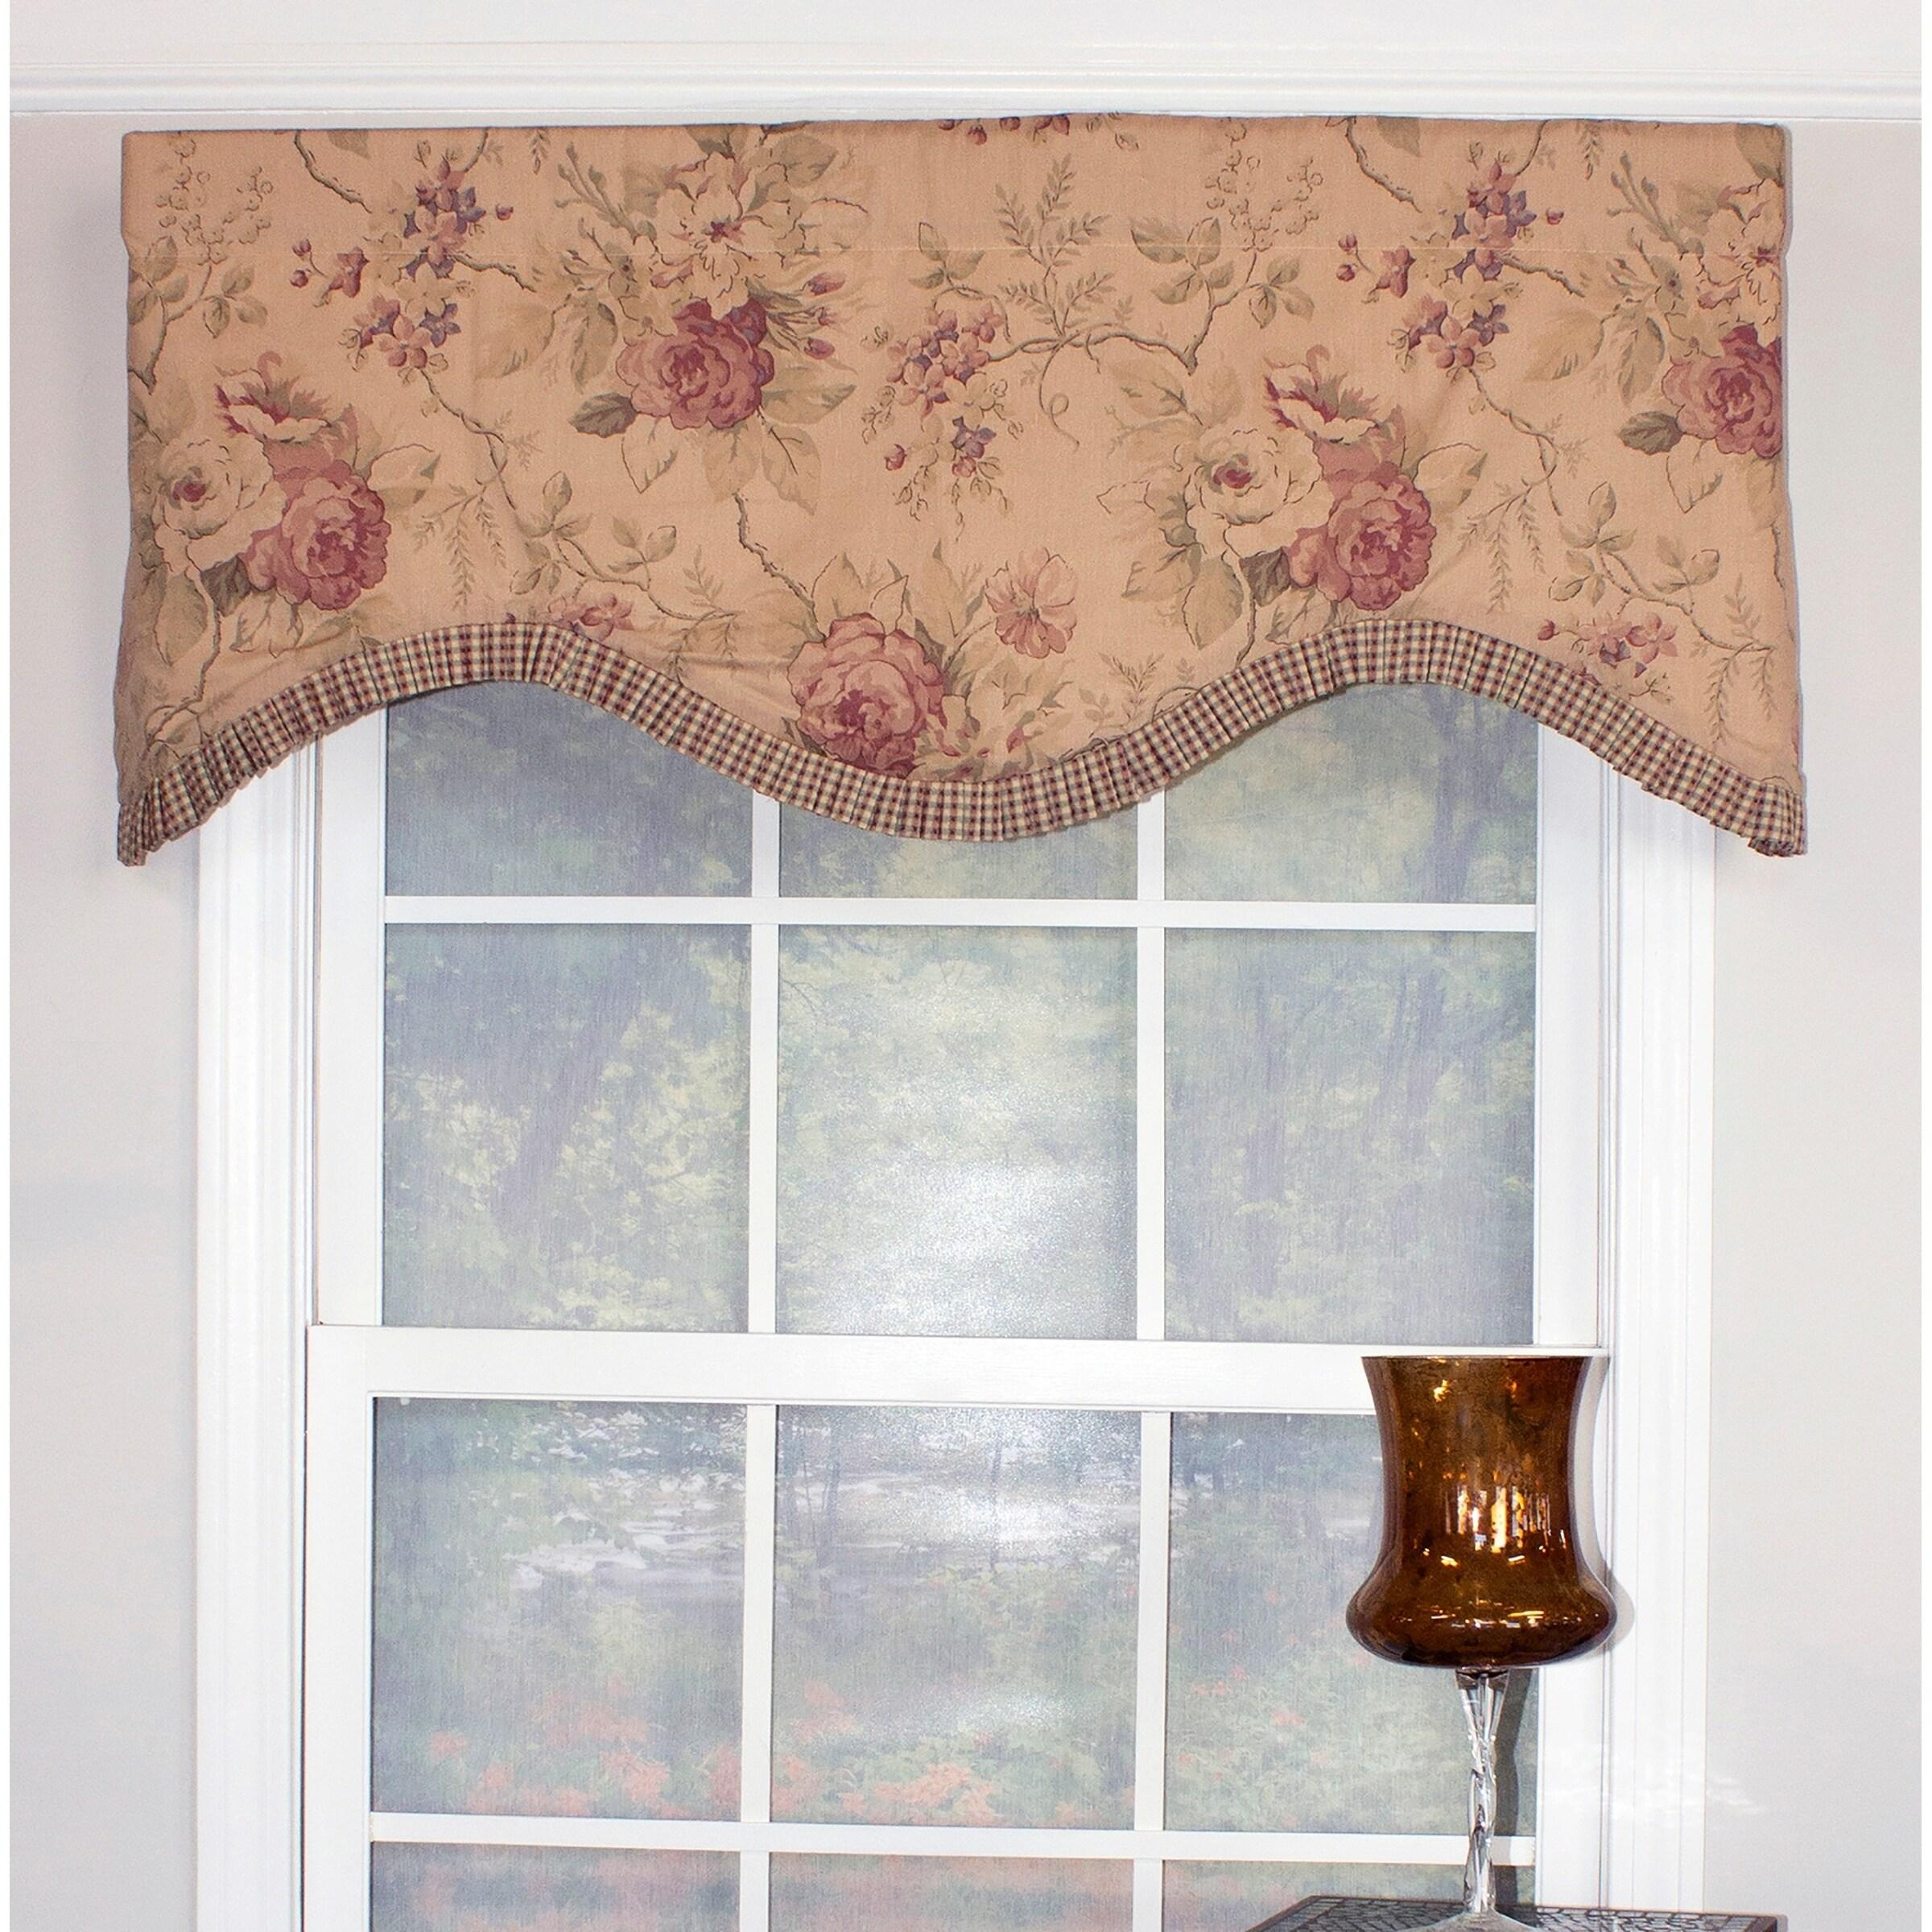 cornice window valance living room bay window shop rlf home doreen cornice window valance earth free shipping today overstockcom 7327185